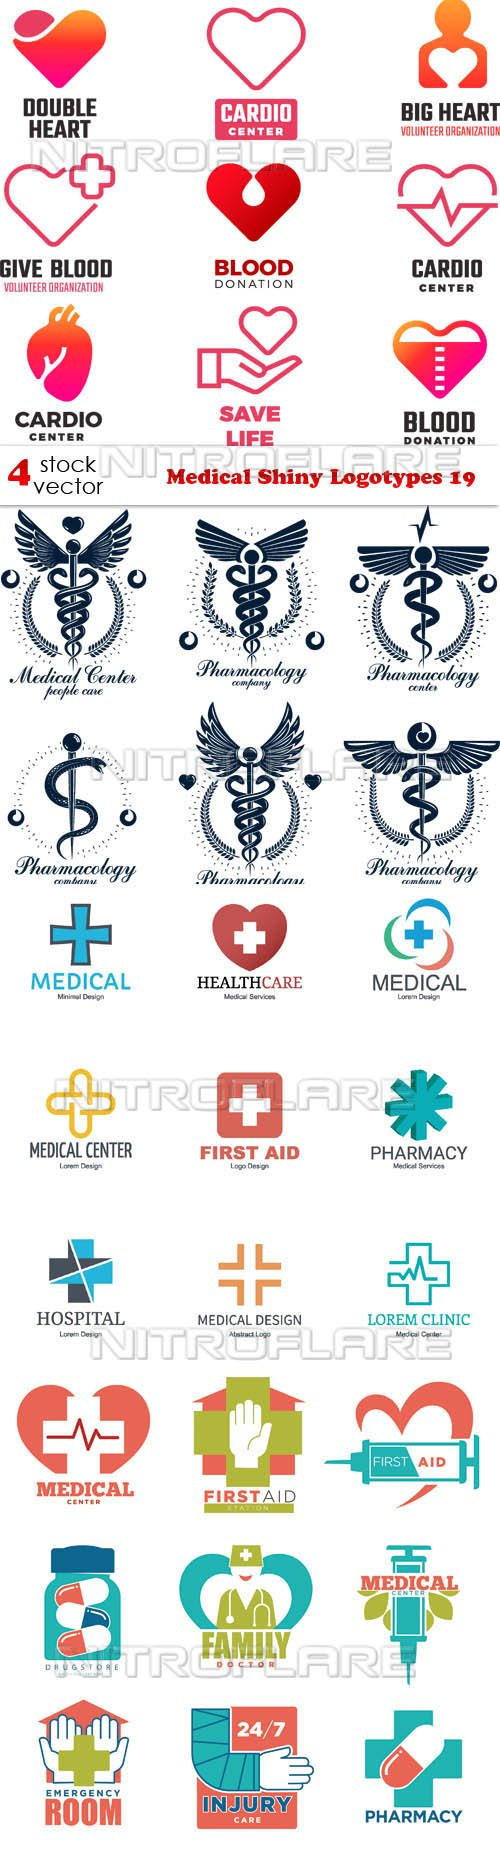 Vectors - Medical Shiny Logotypes 19